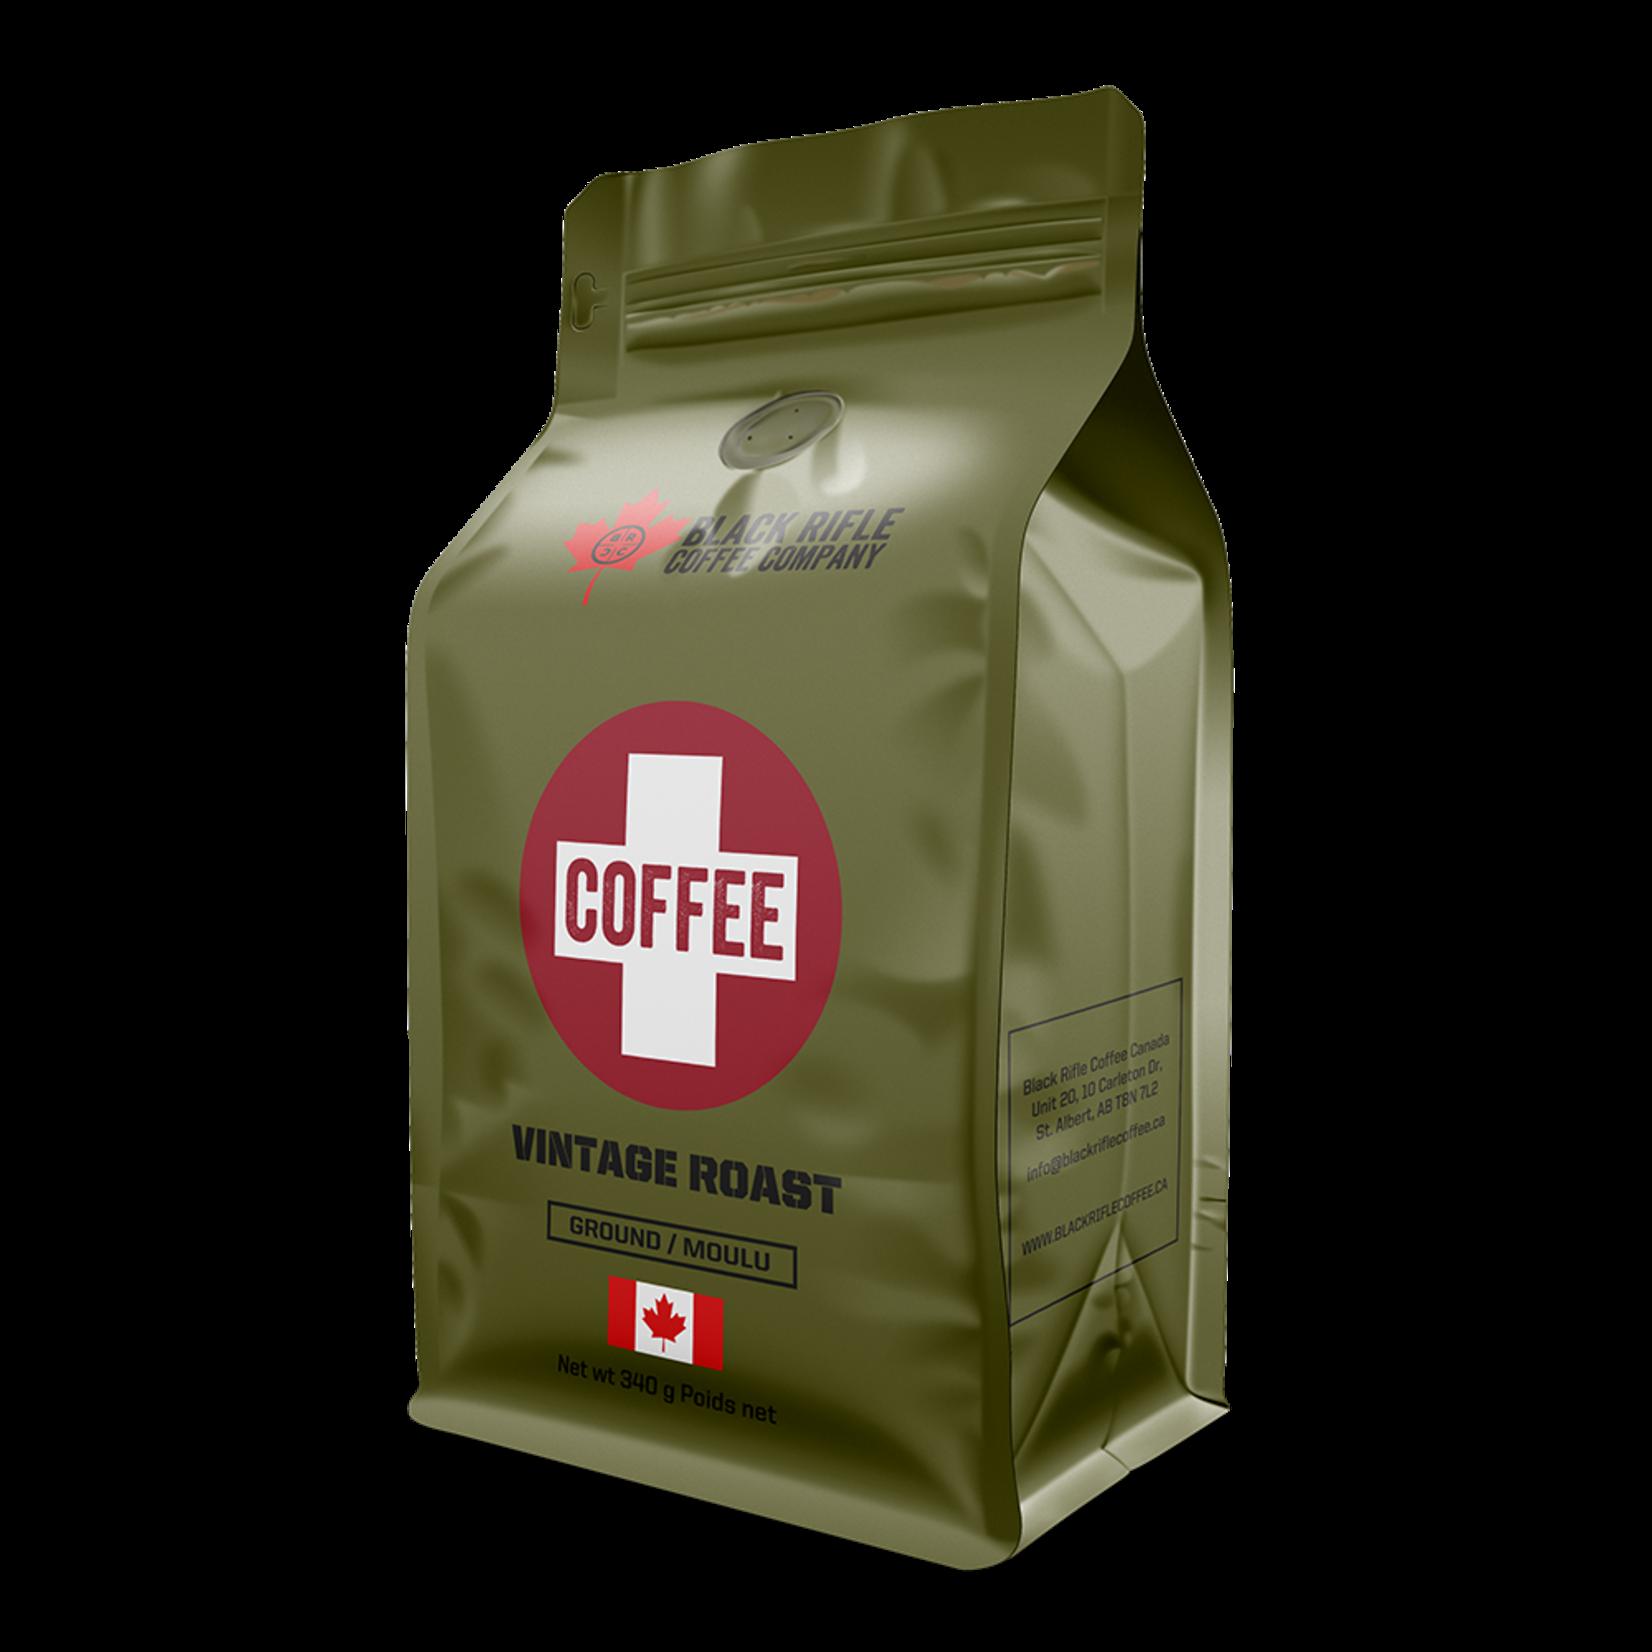 Black Rifle Coffee BRCC Coffee Saves Lives Beans (vintage roast)